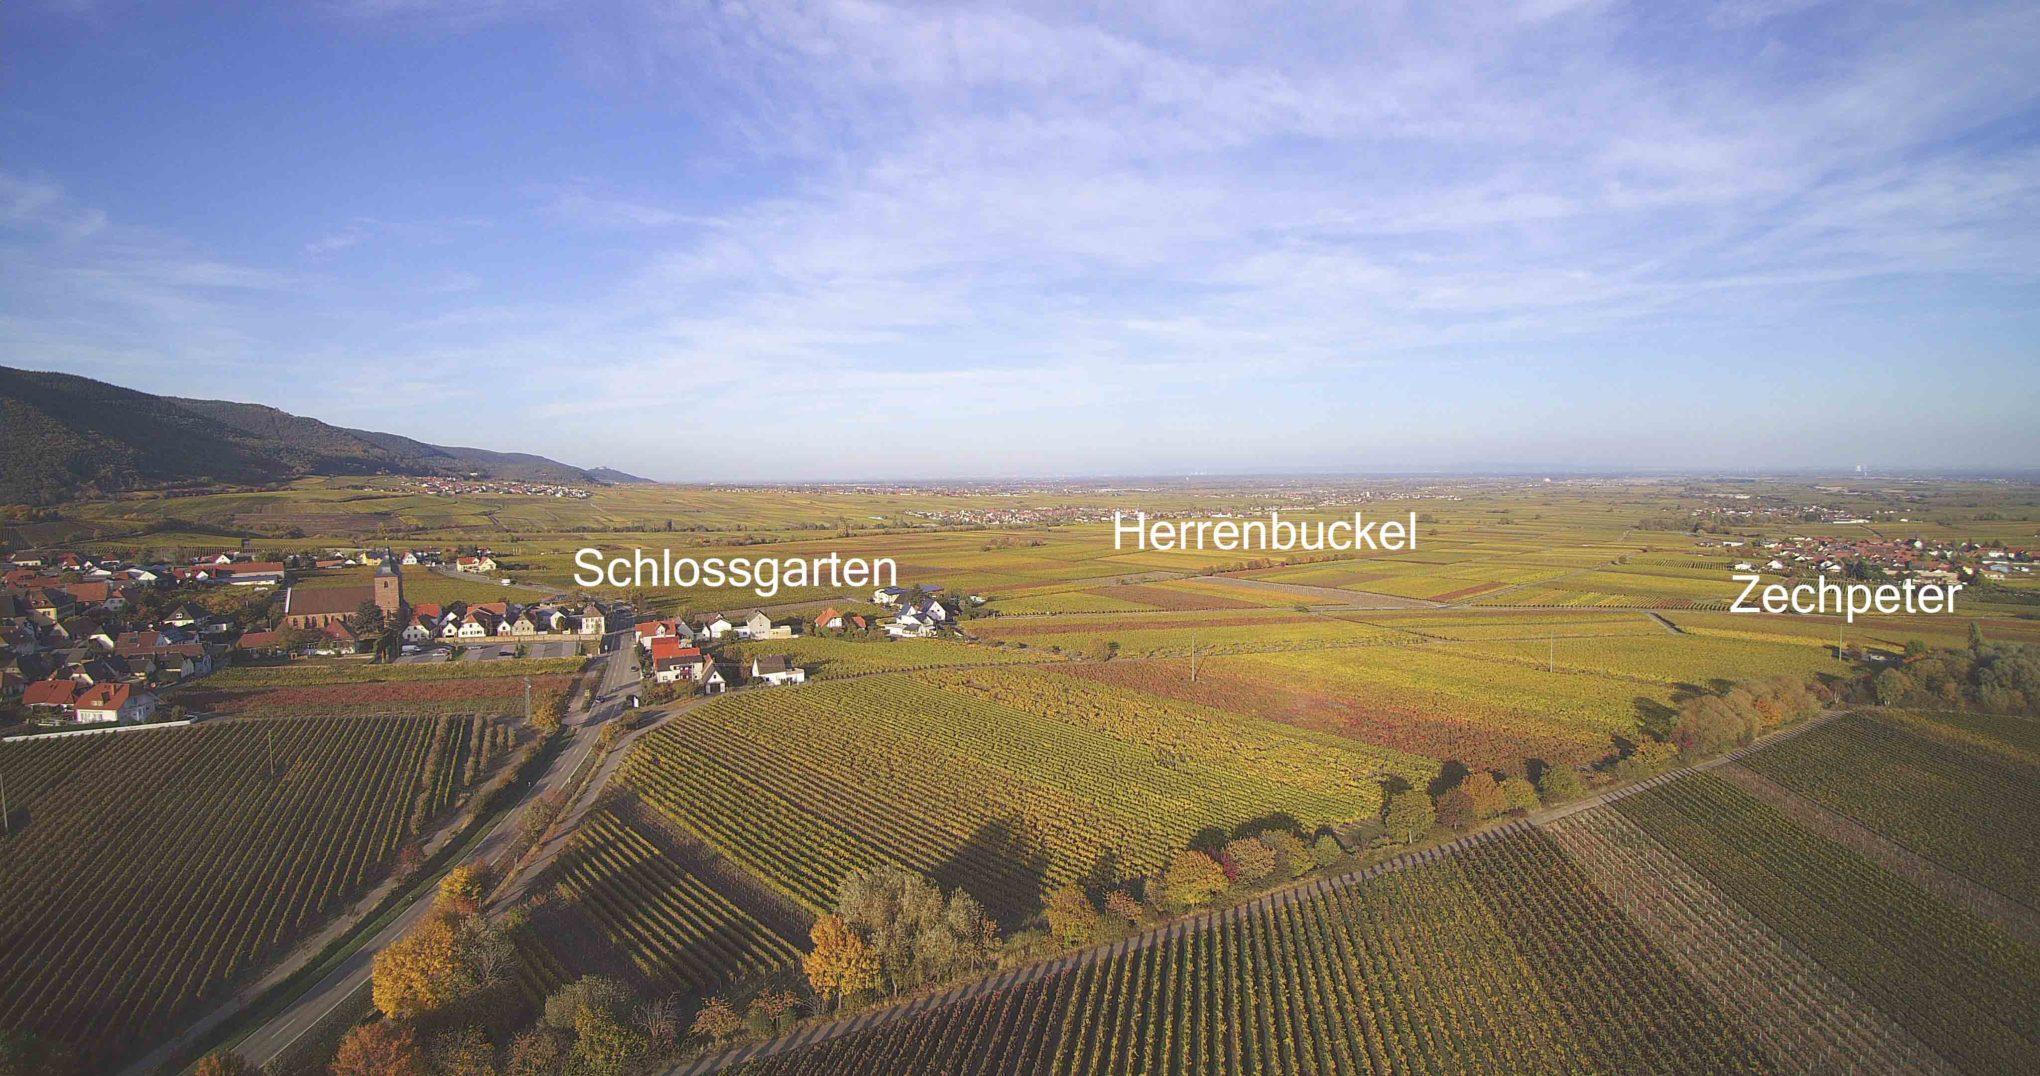 Herrenbuckel Zechpeter und Schlossgarten